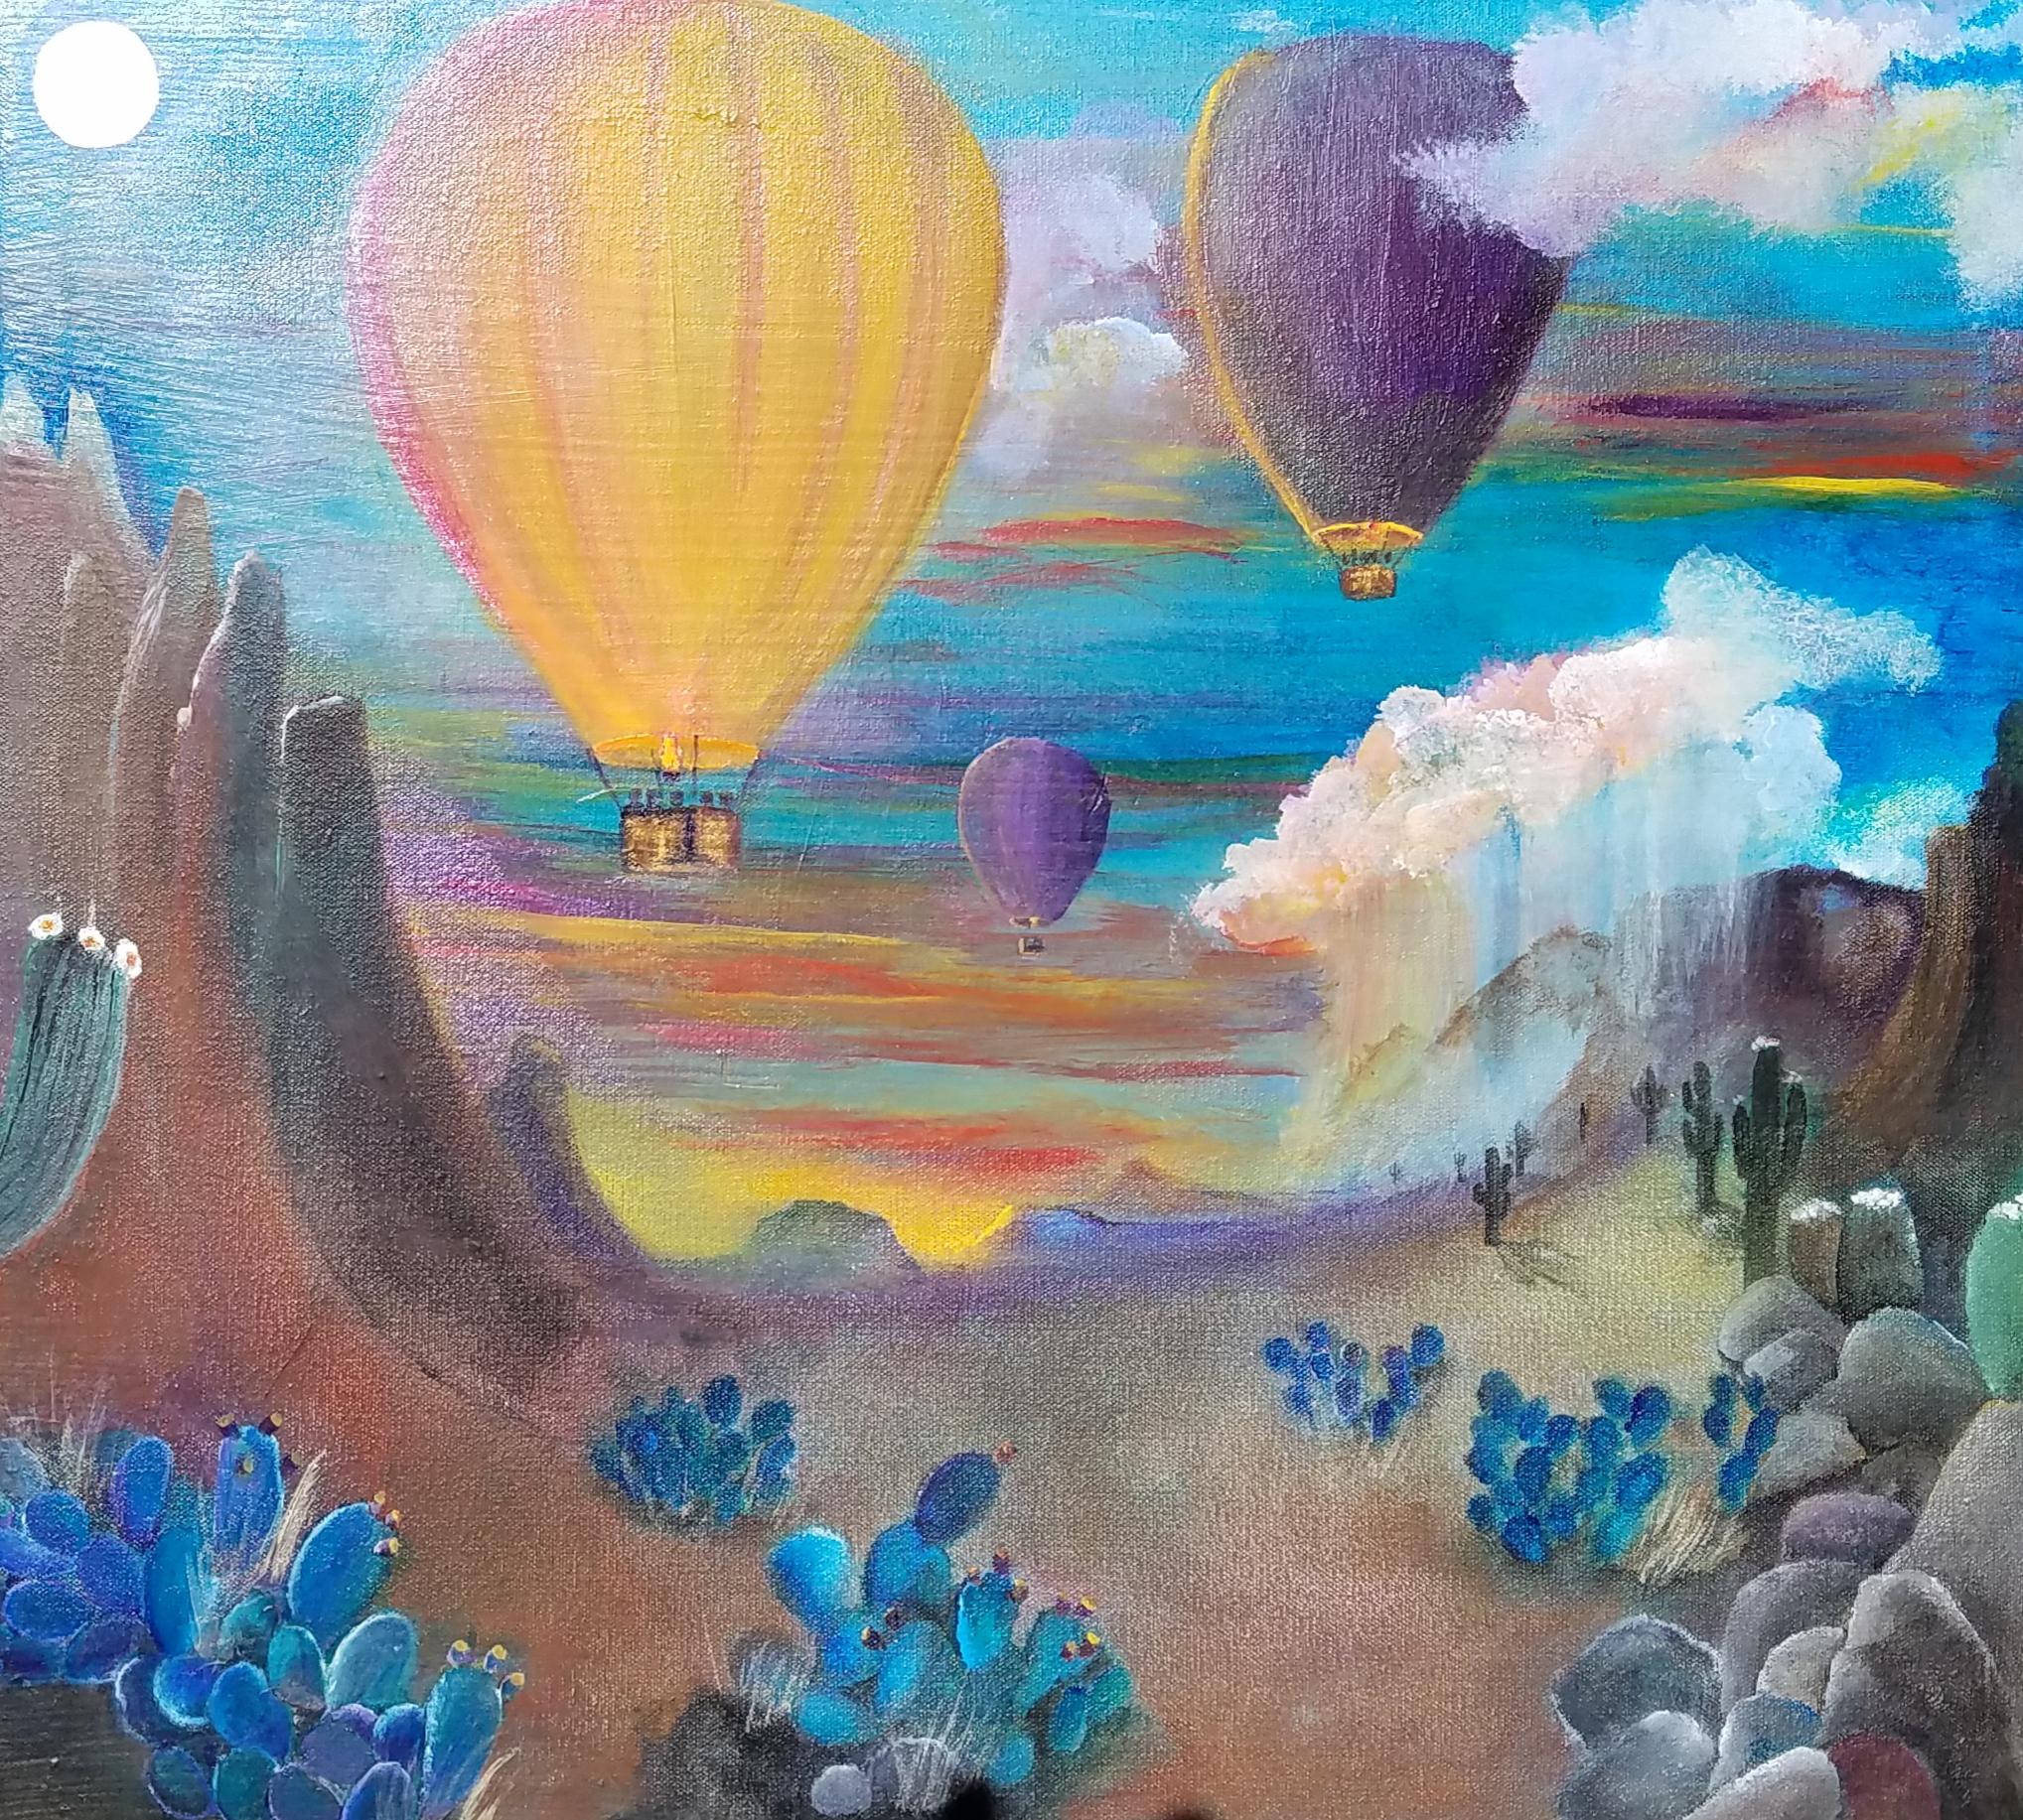 Ballooning at Dusk